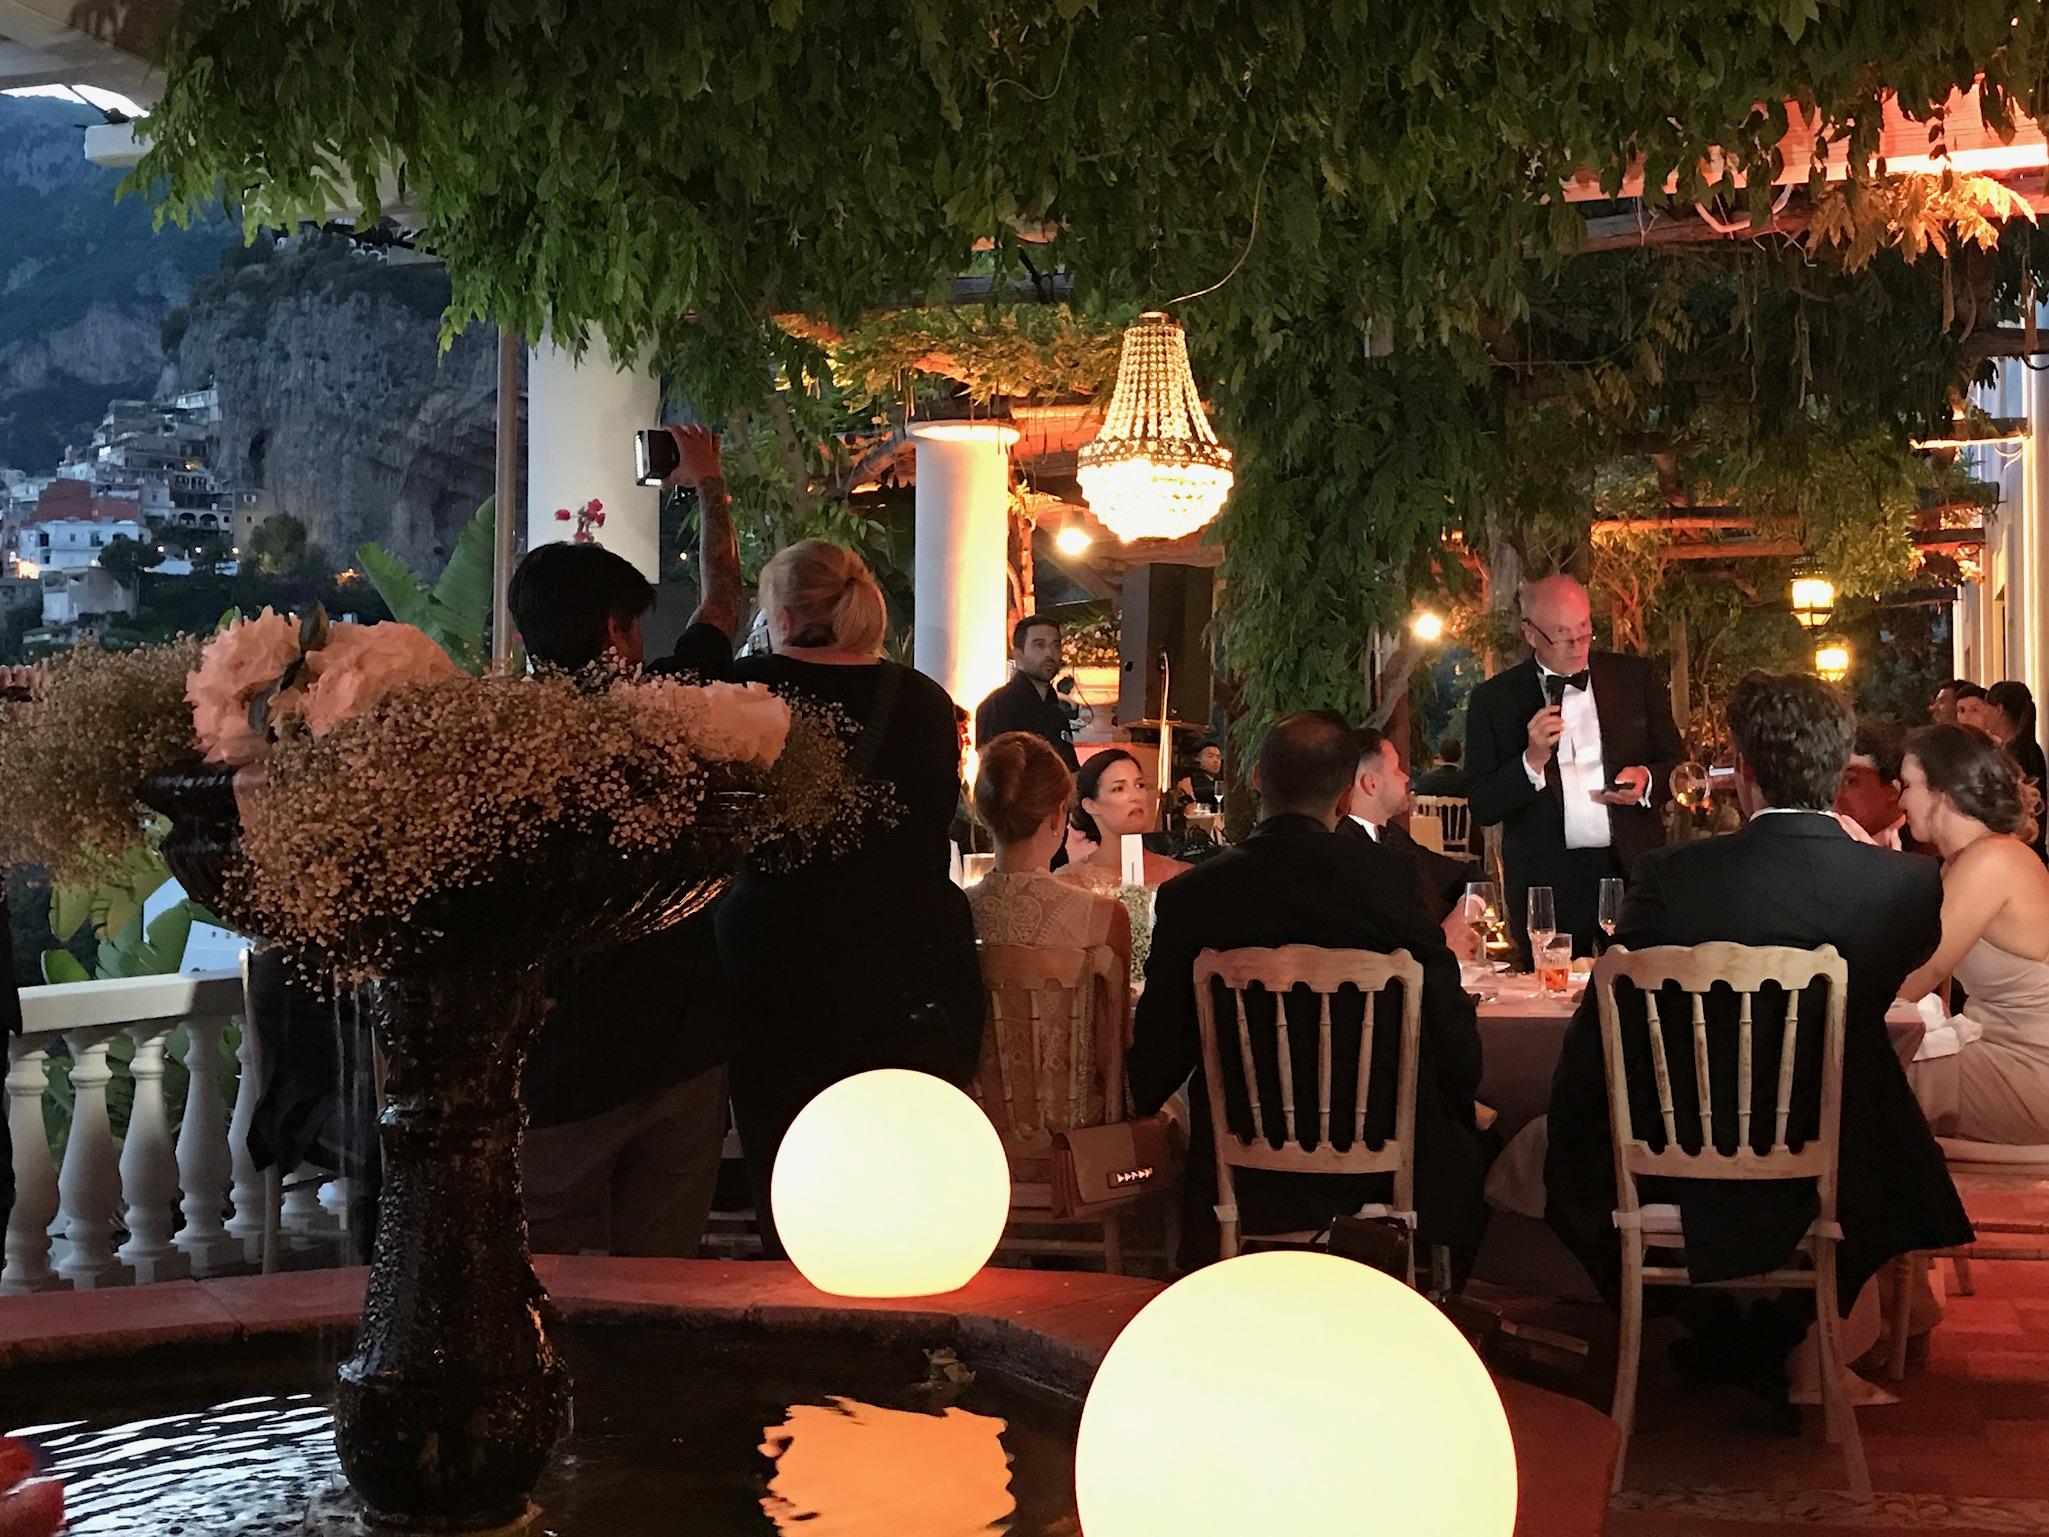 https://www.weddingamalfi.com/wp-content/uploads/Nathalie-and-Benjamin-Wedding-in-Positano-Italy-3.jpg